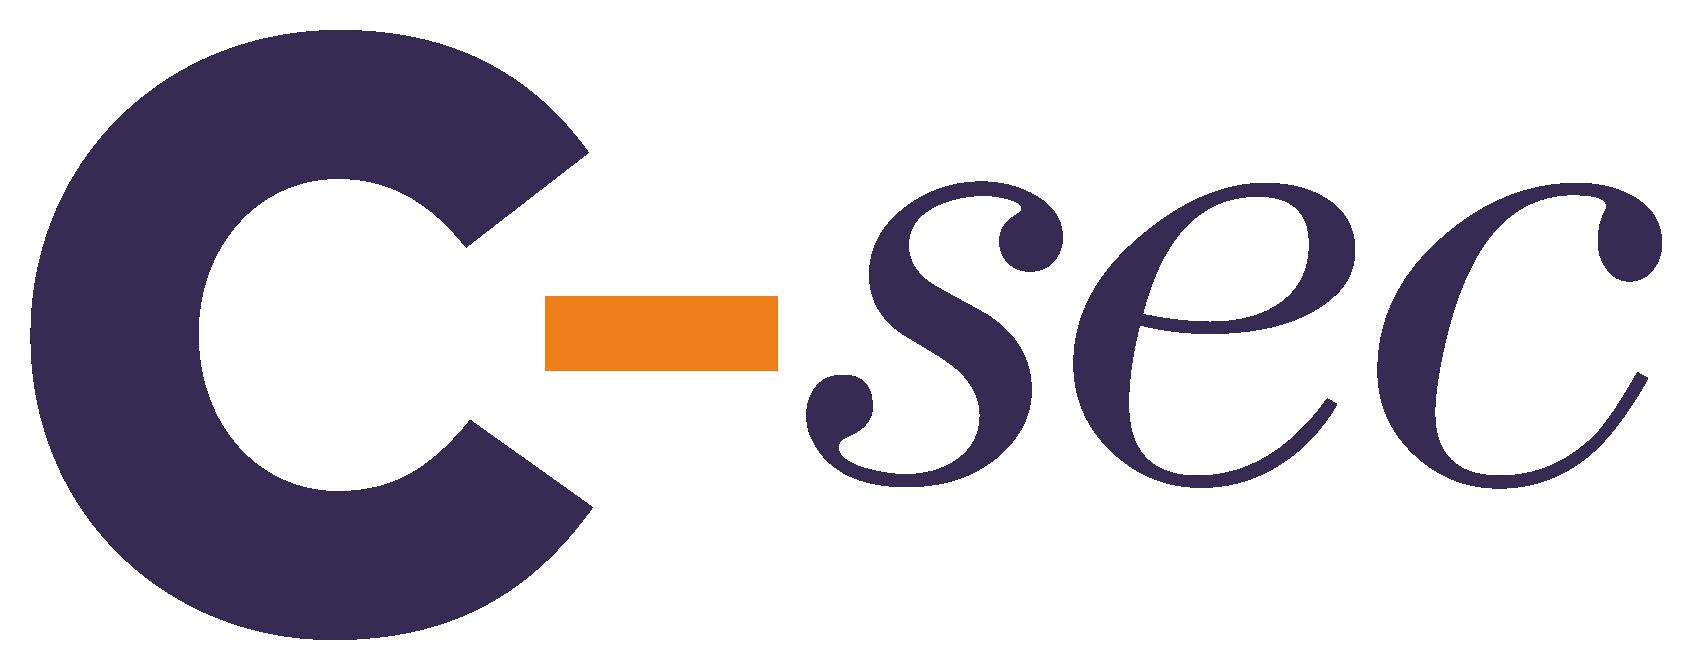 C-sec Technologies